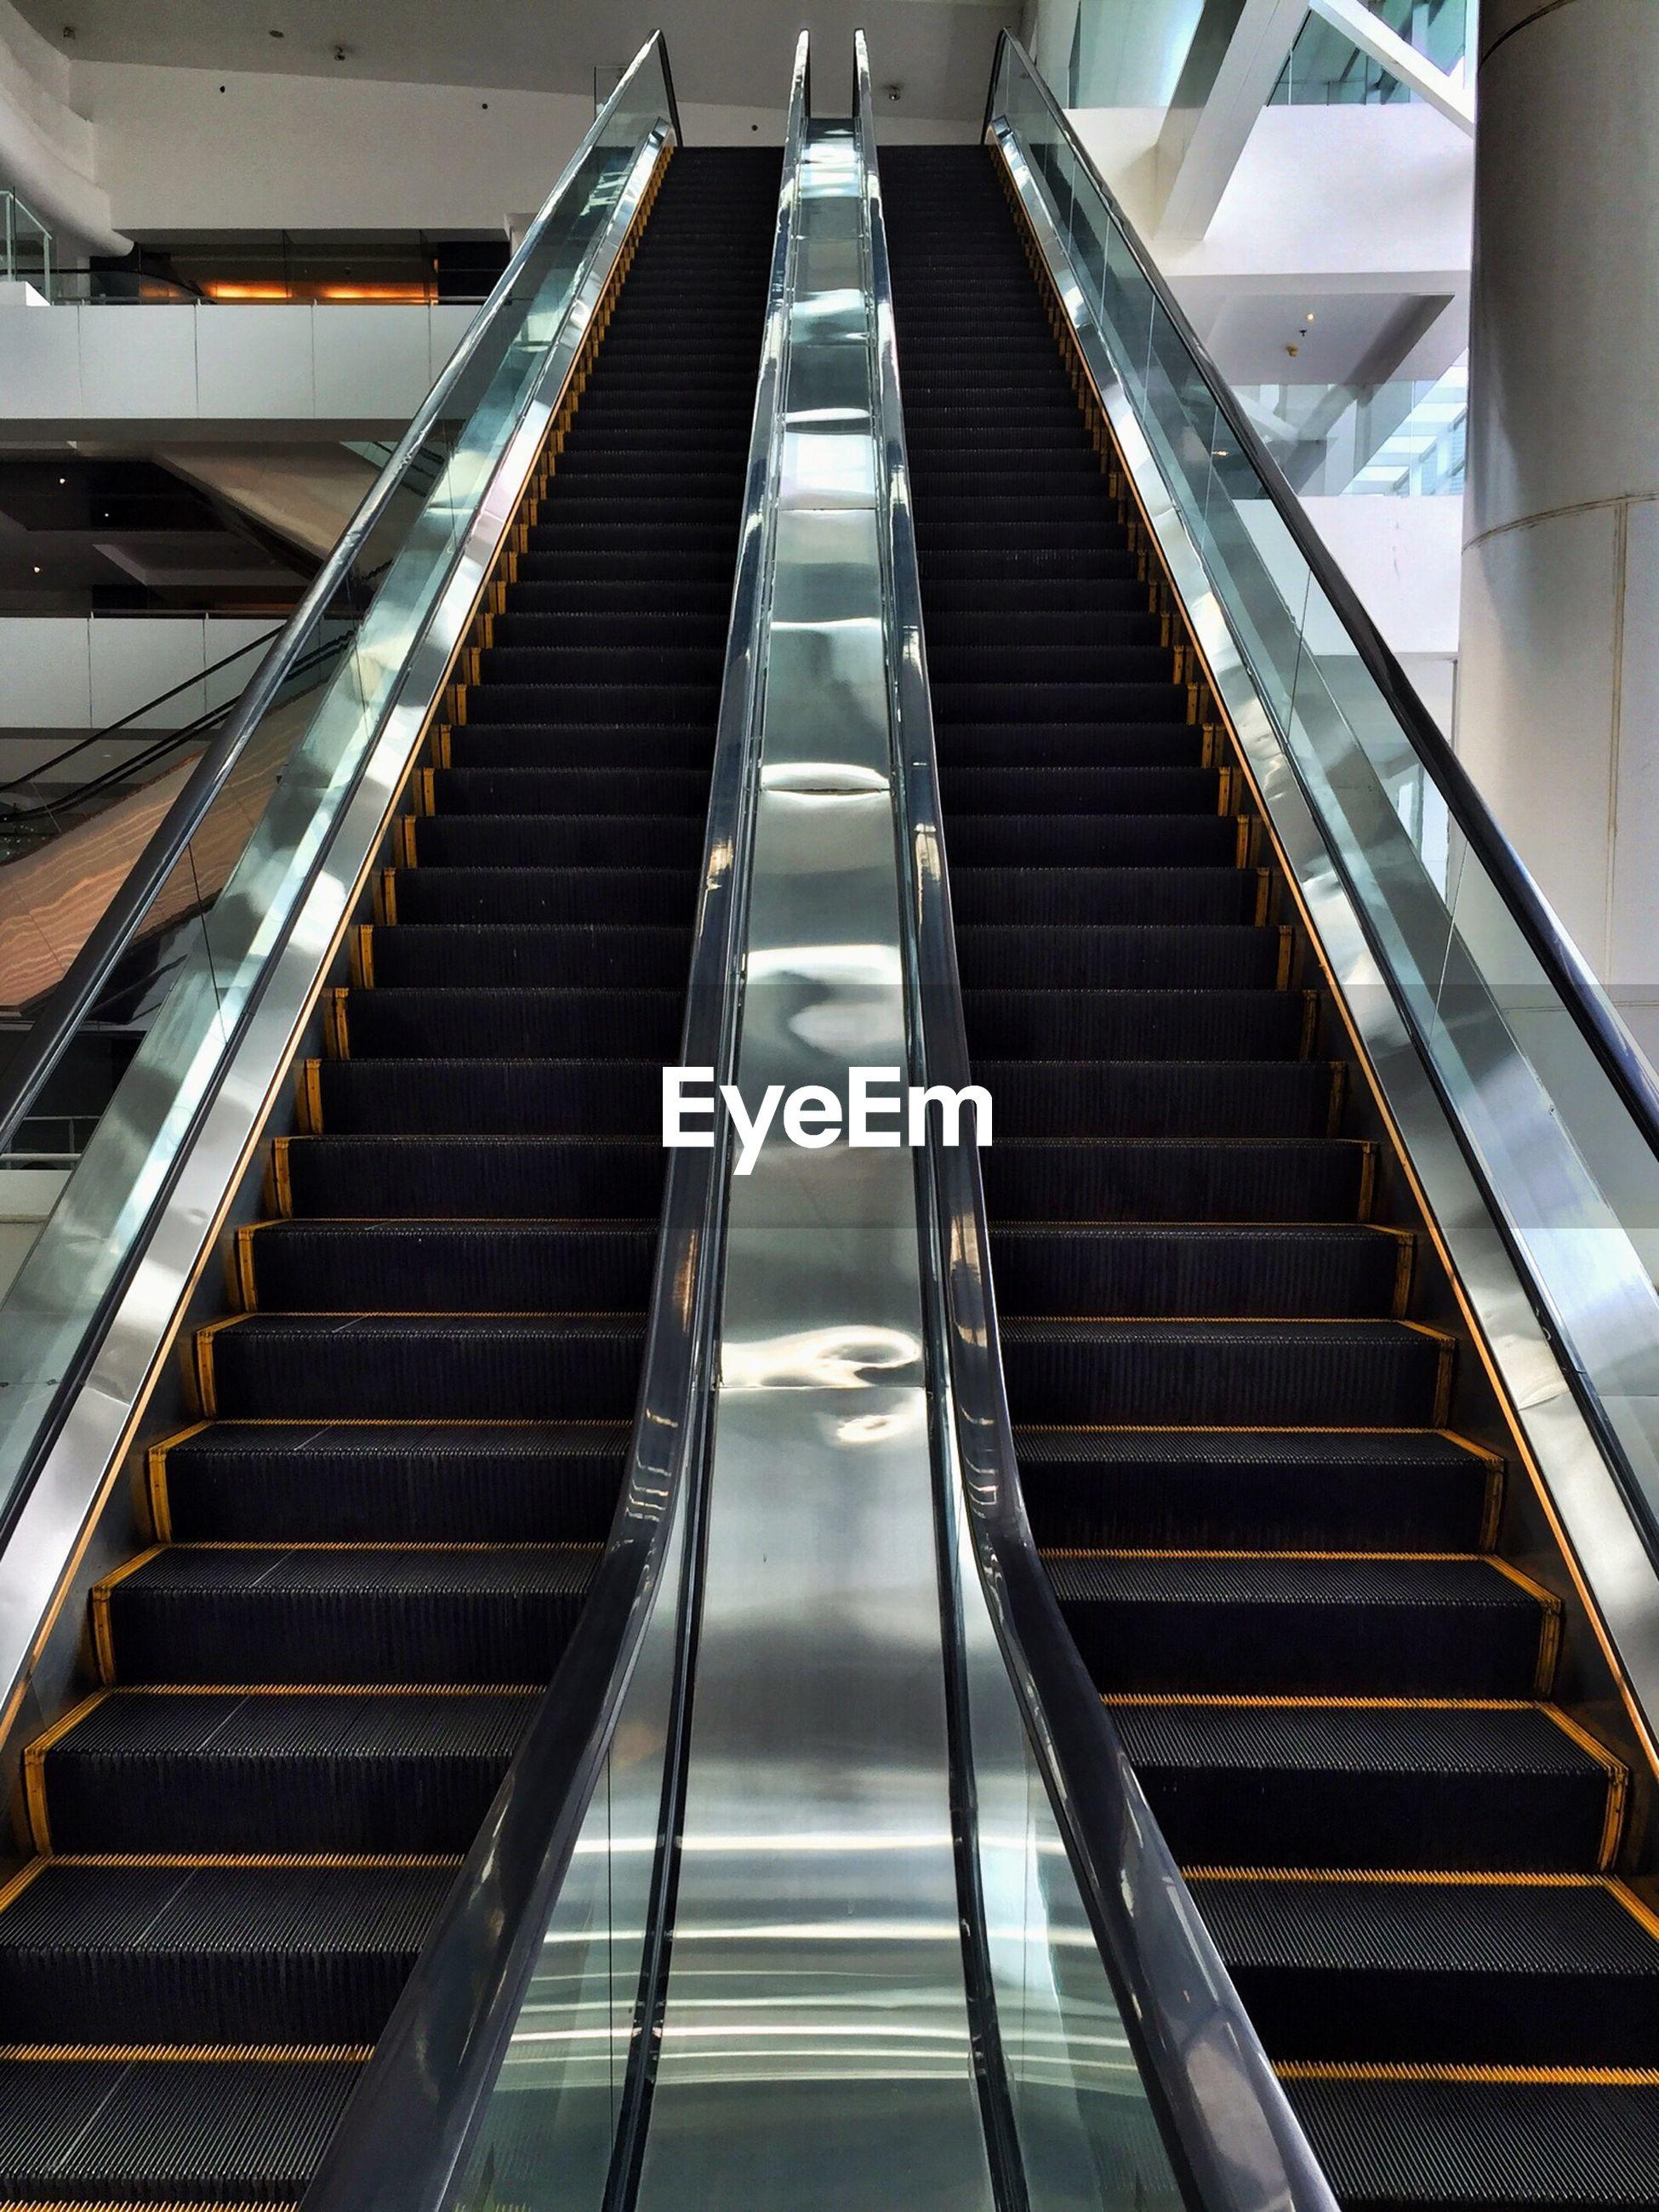 Escalators in modern building